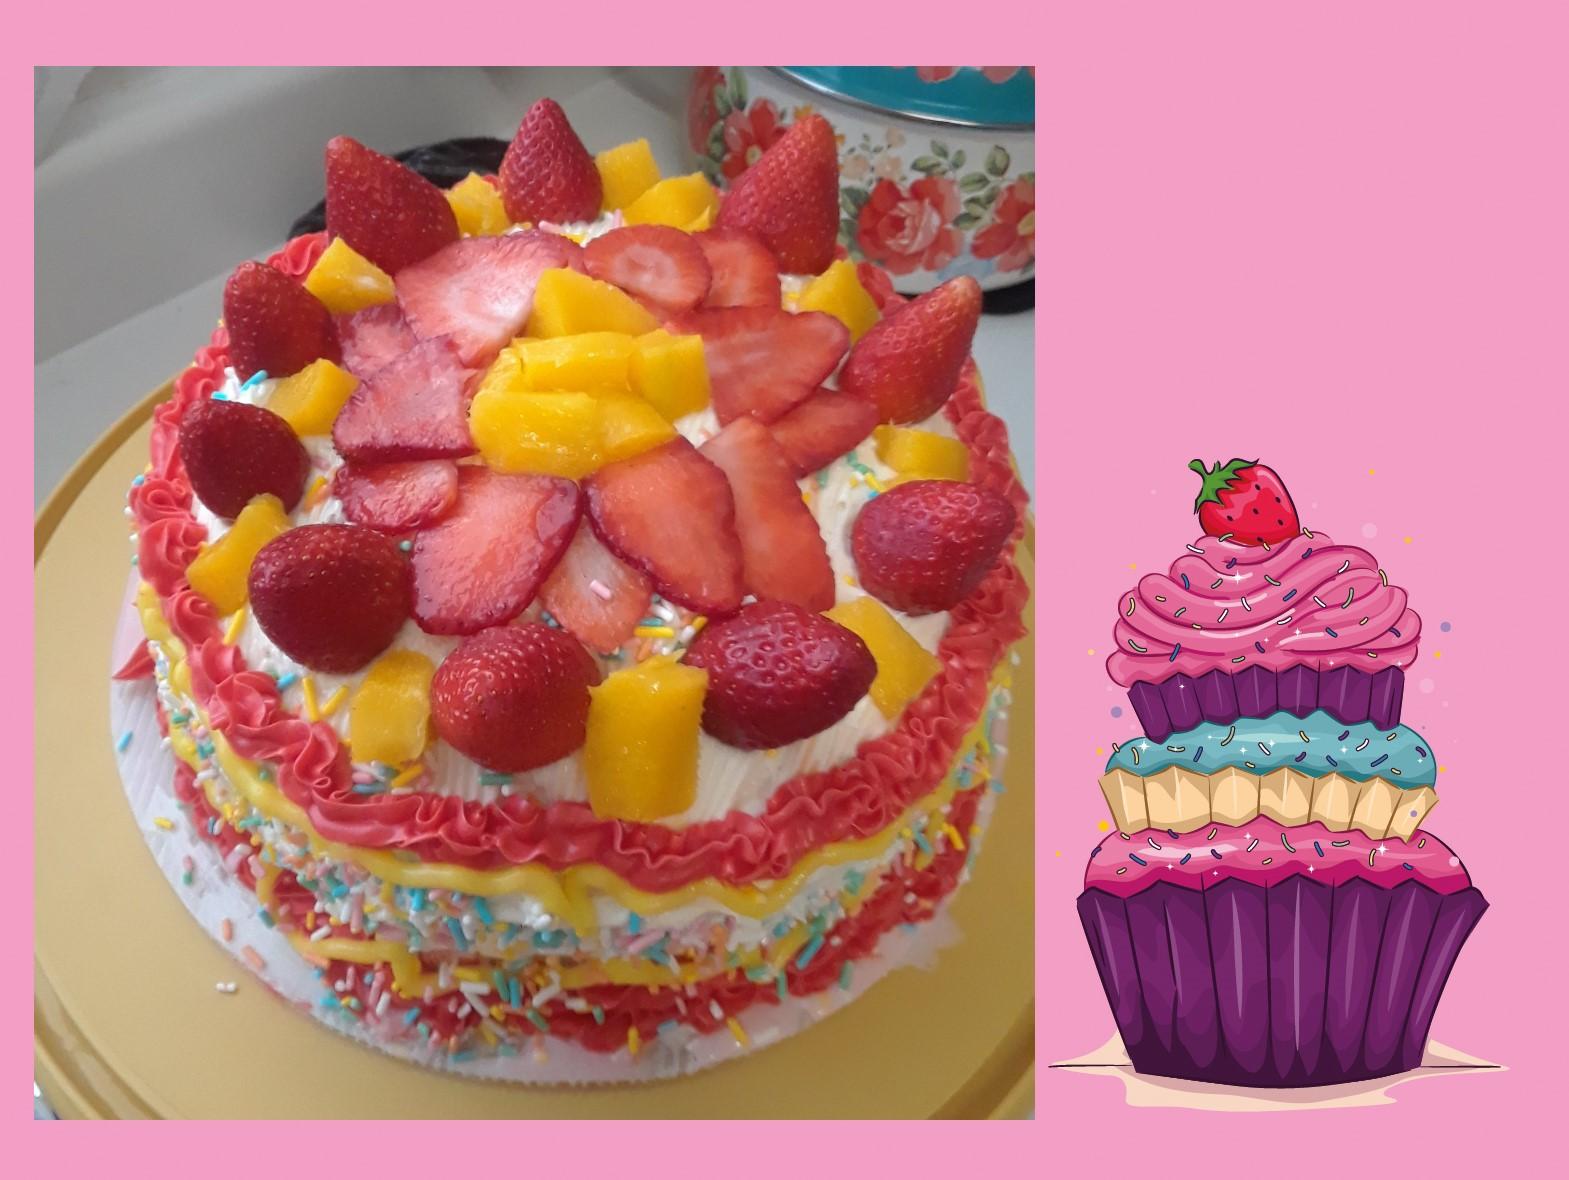 The Tropical Cake